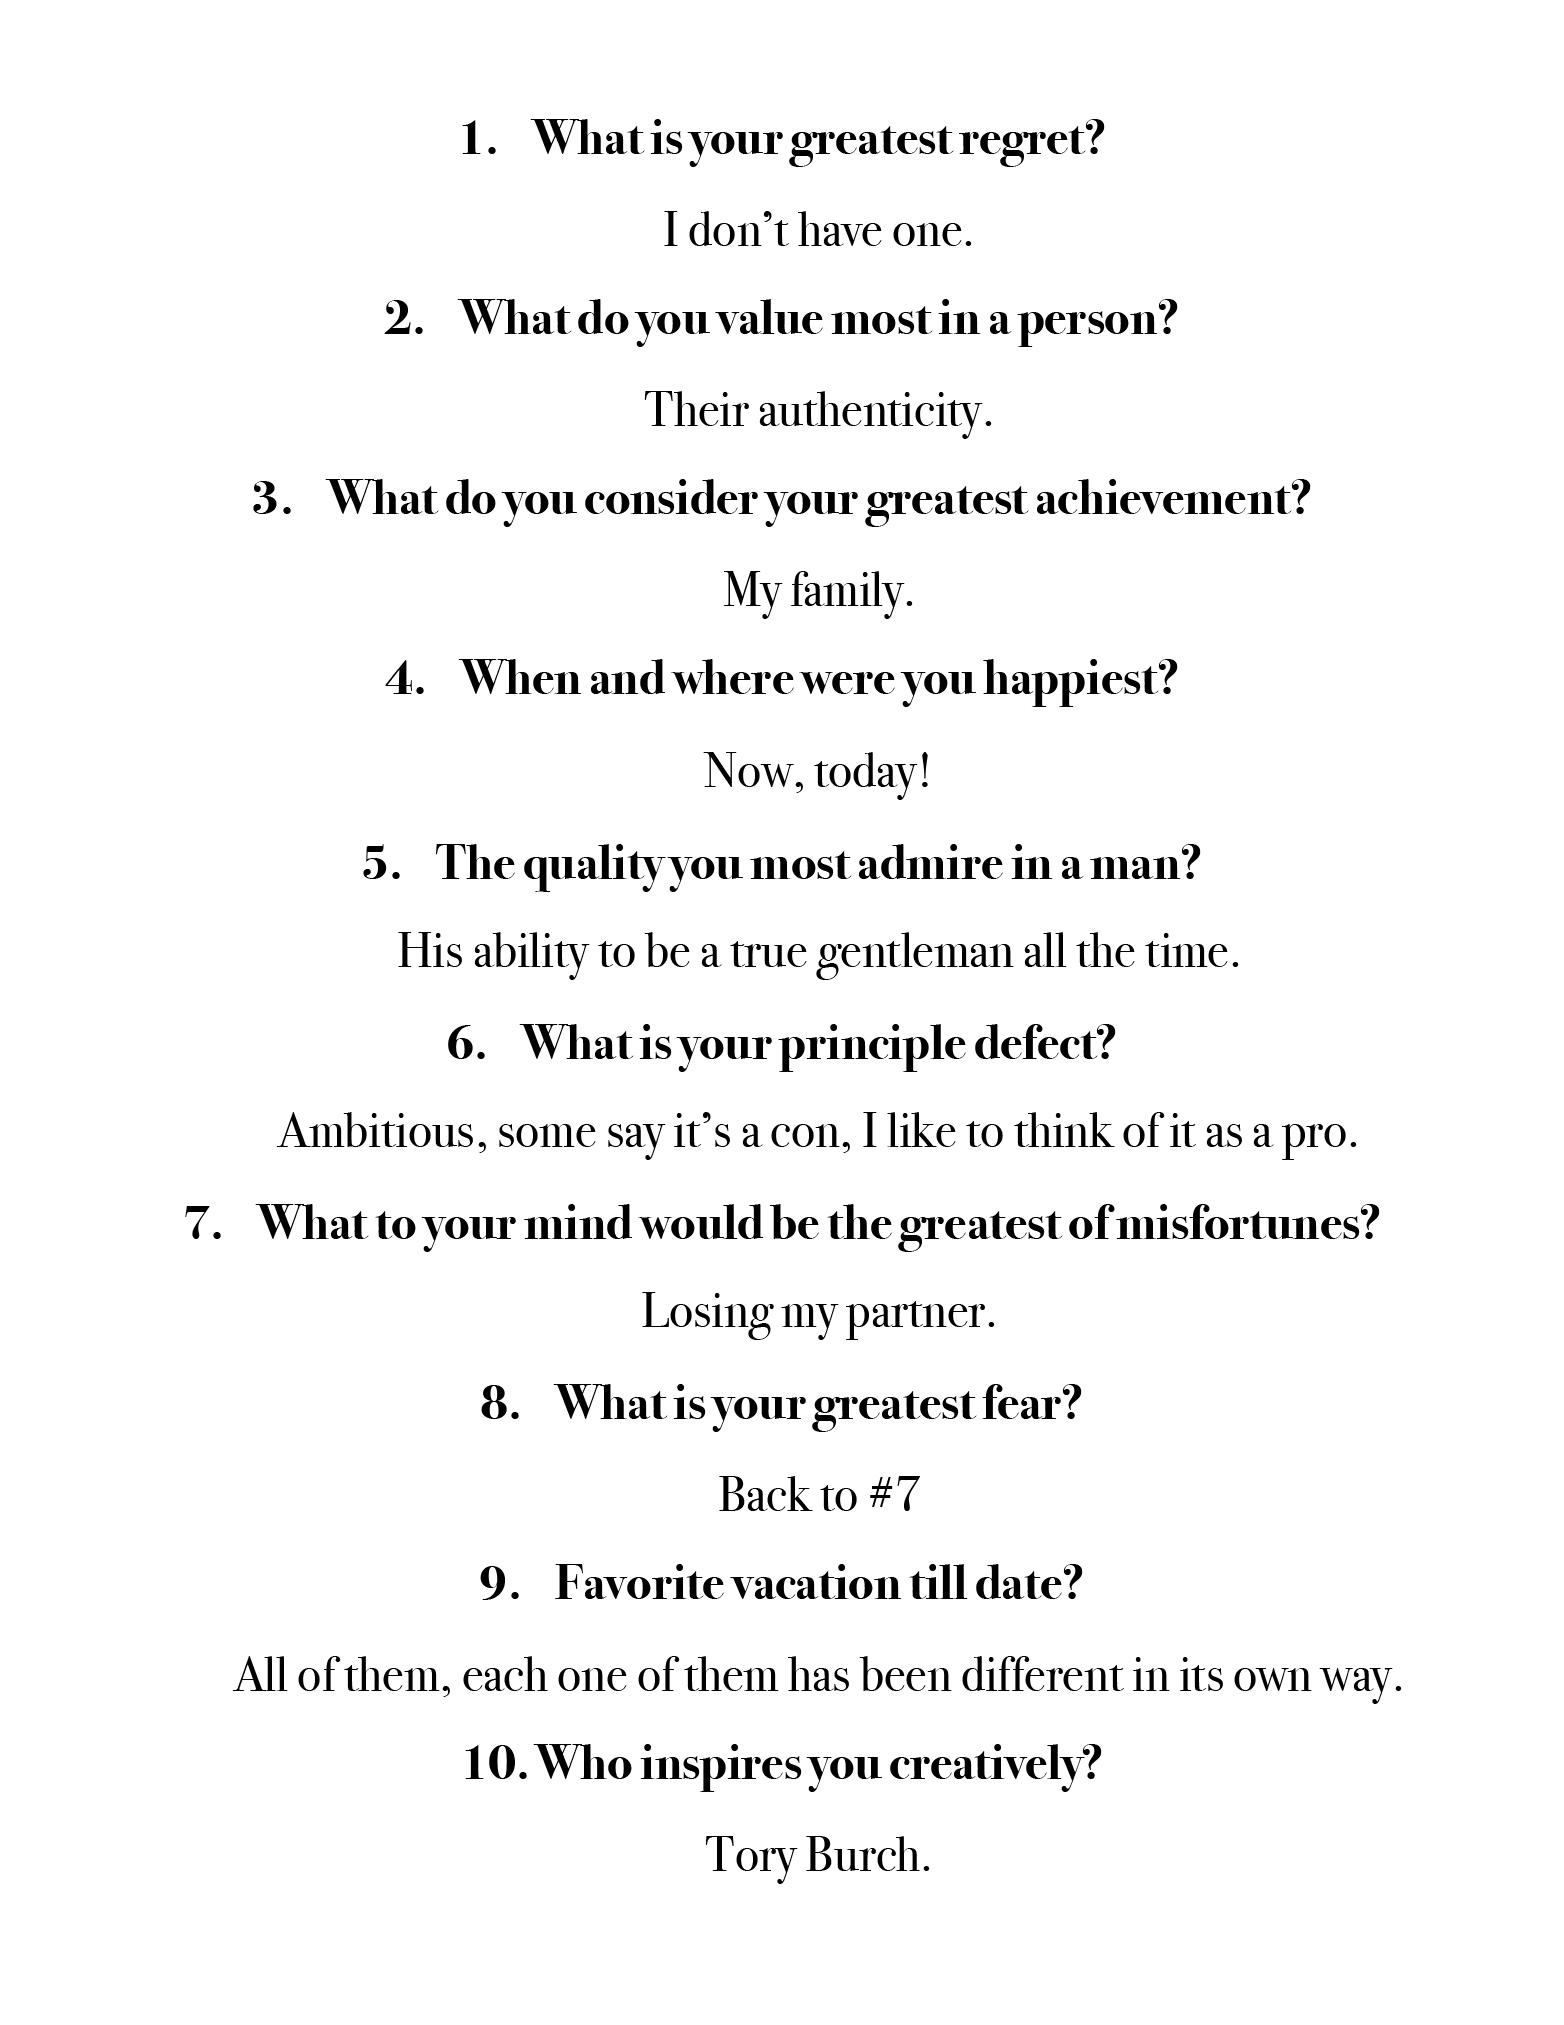 cuestionariocristina.jpg